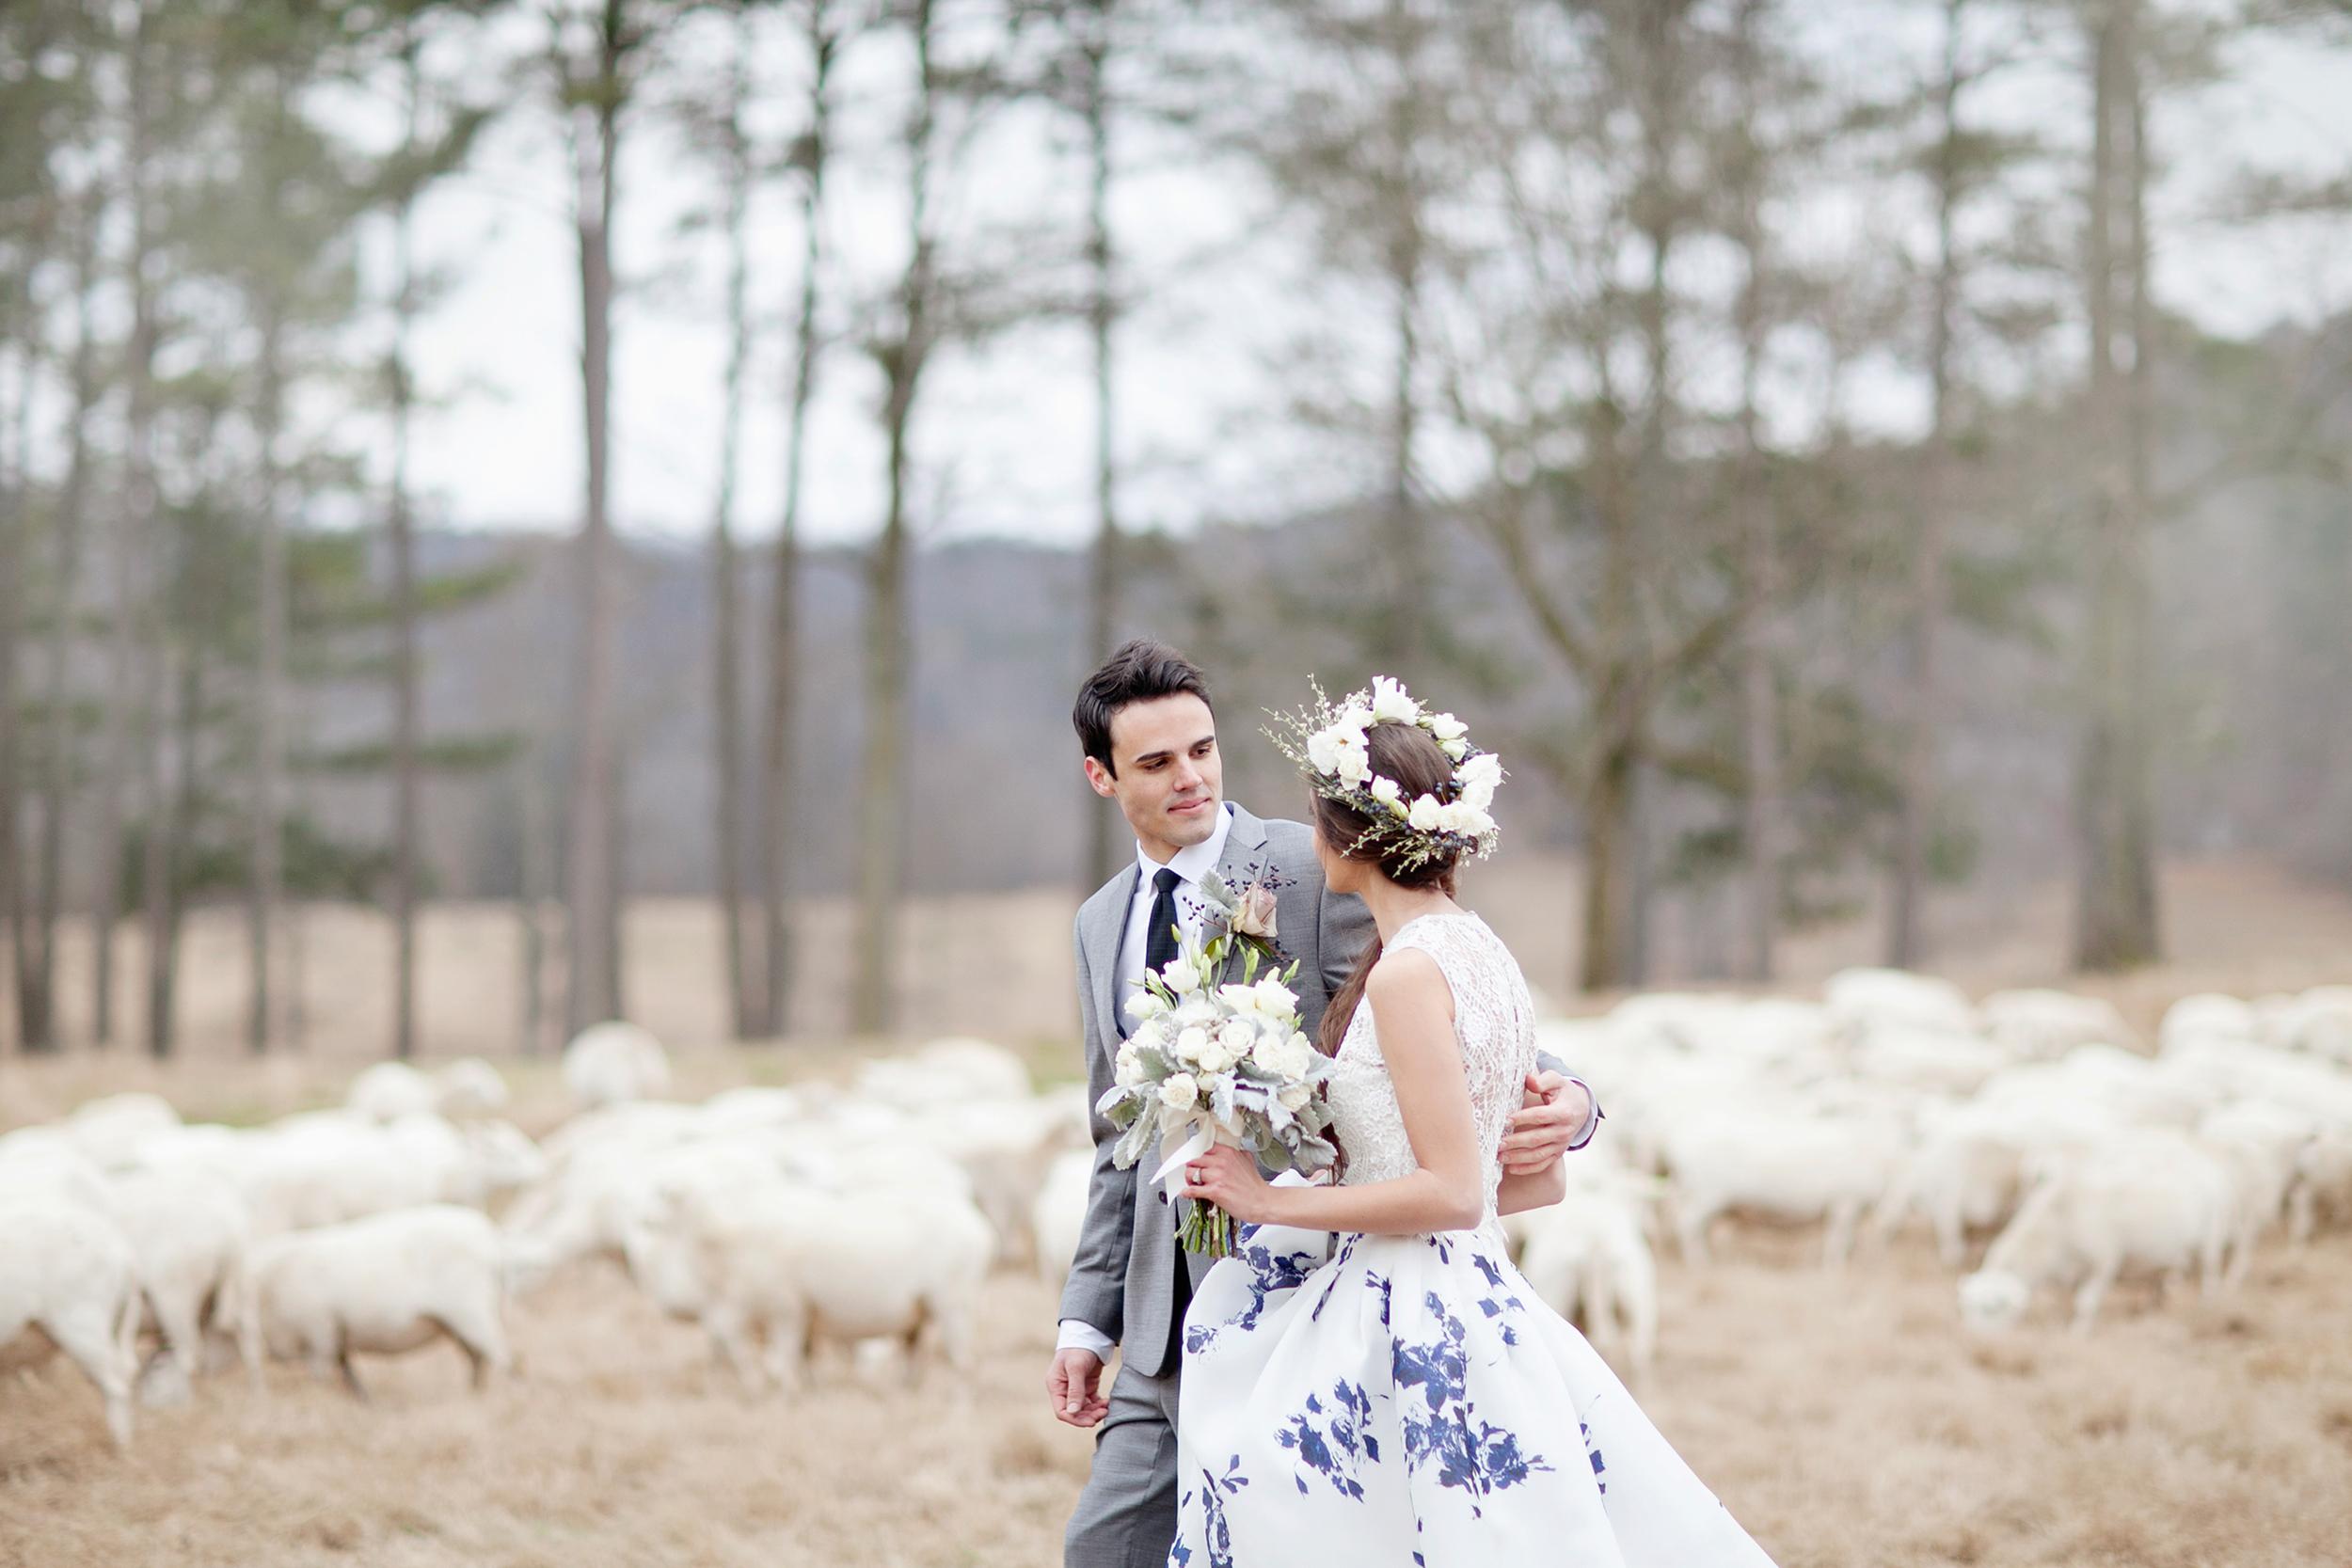 san-francisco-wedding-photographer-sleepy-fox-photography (102 of 343).jpg